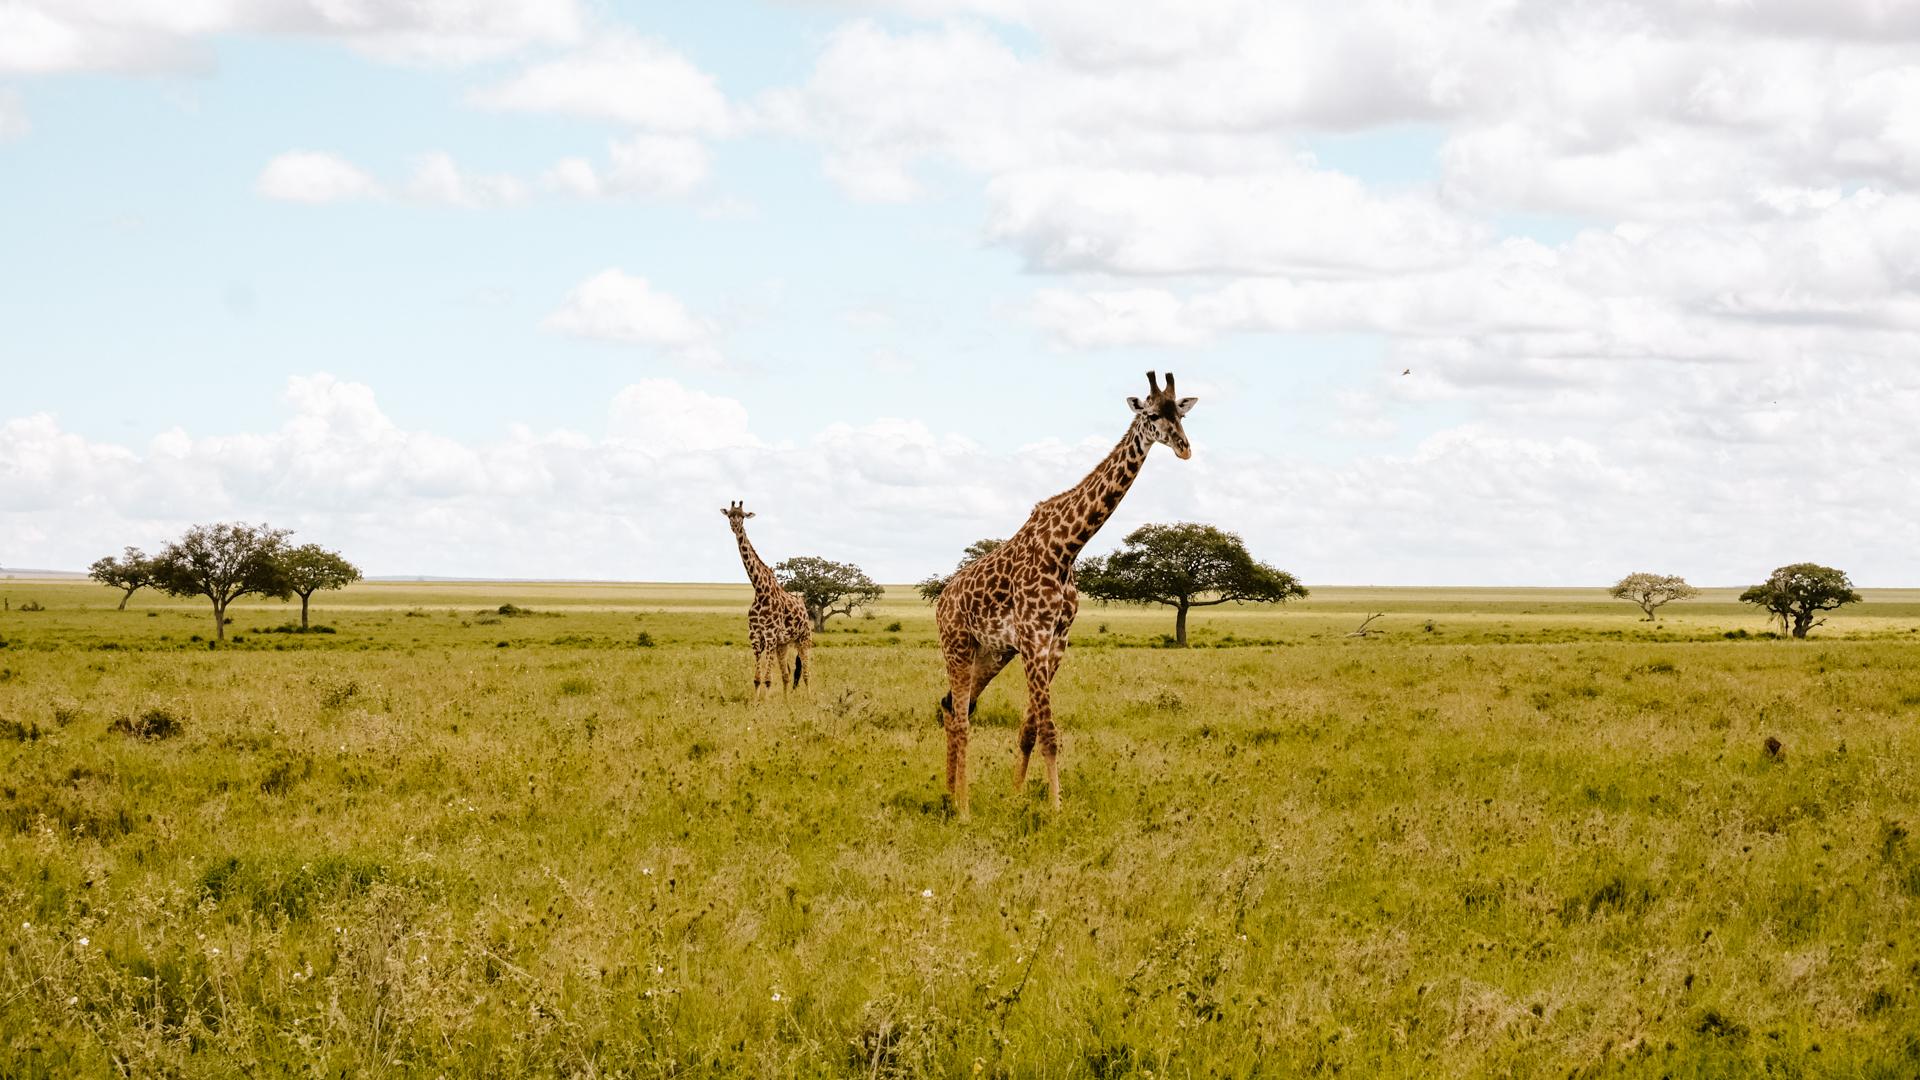 Giraffes on the never ending savanna of the Serengeti National Park, Tanzania